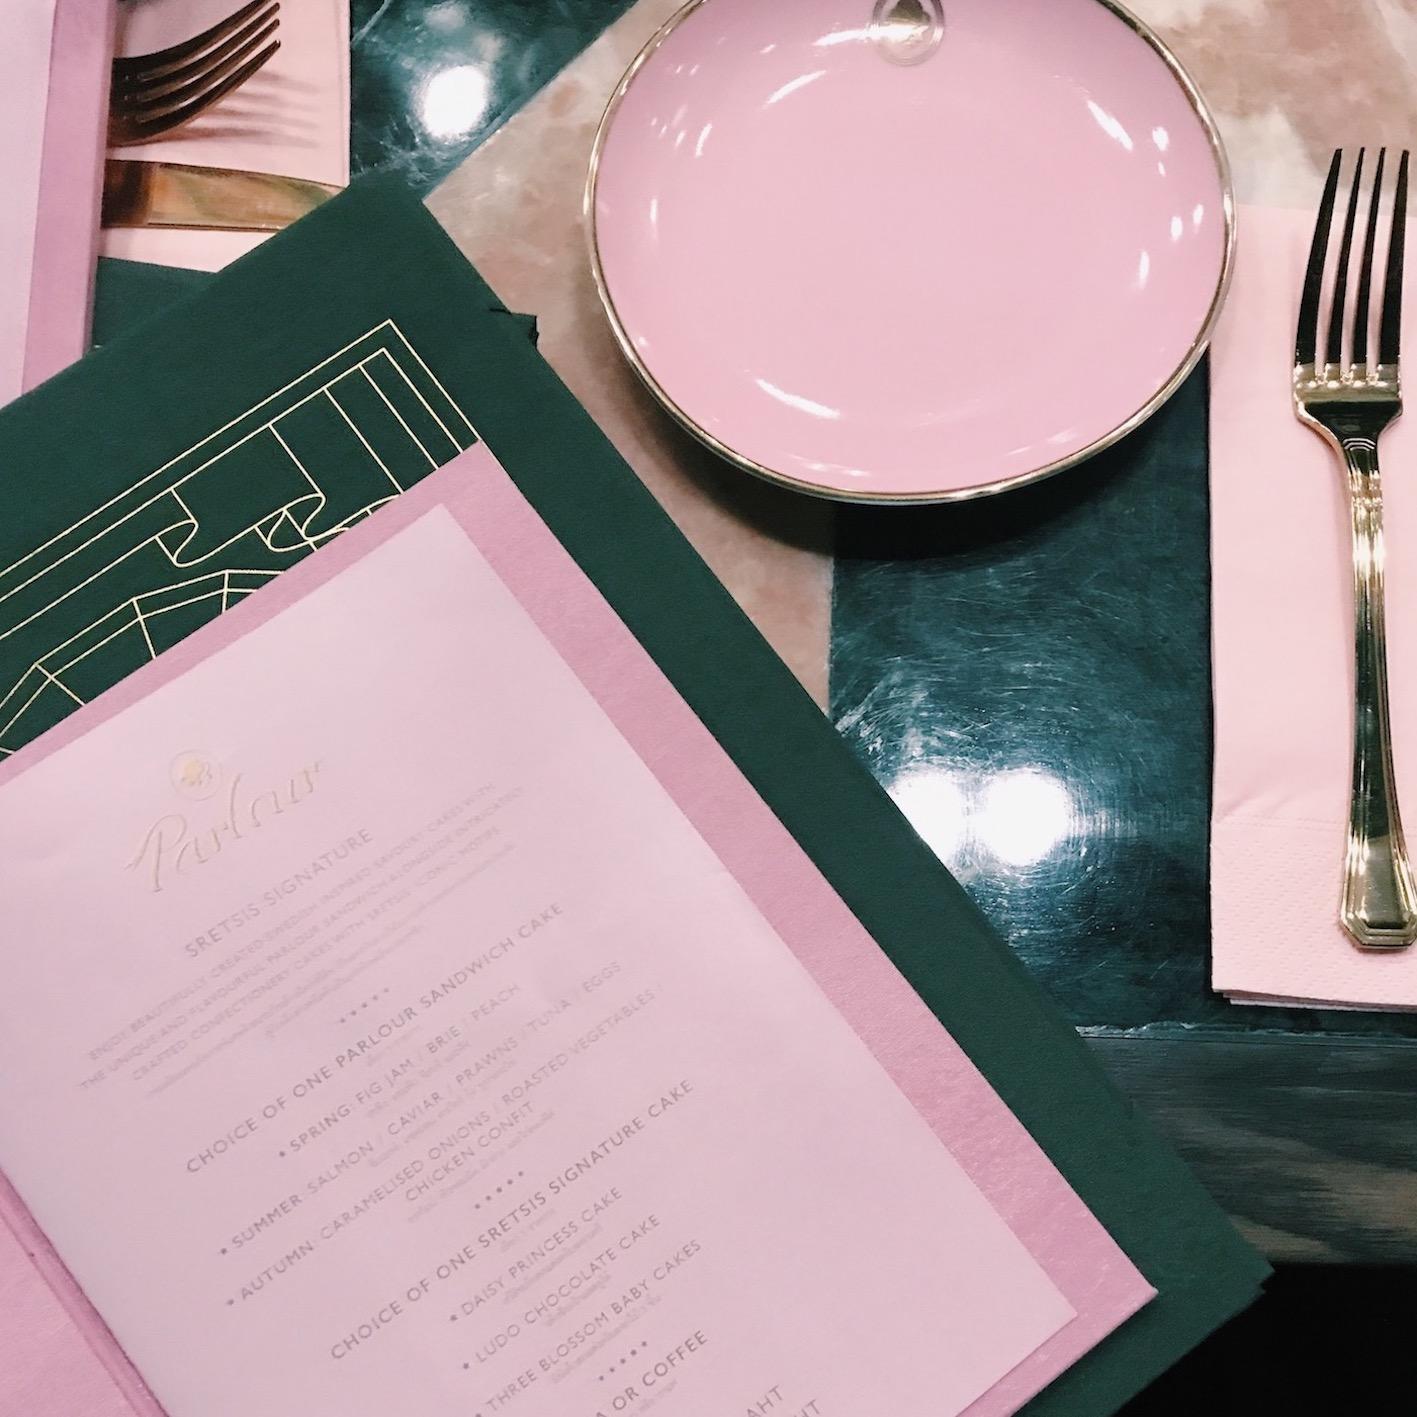 女生 激動 曼谷 新 cafe Sretsis Parlour bangkok